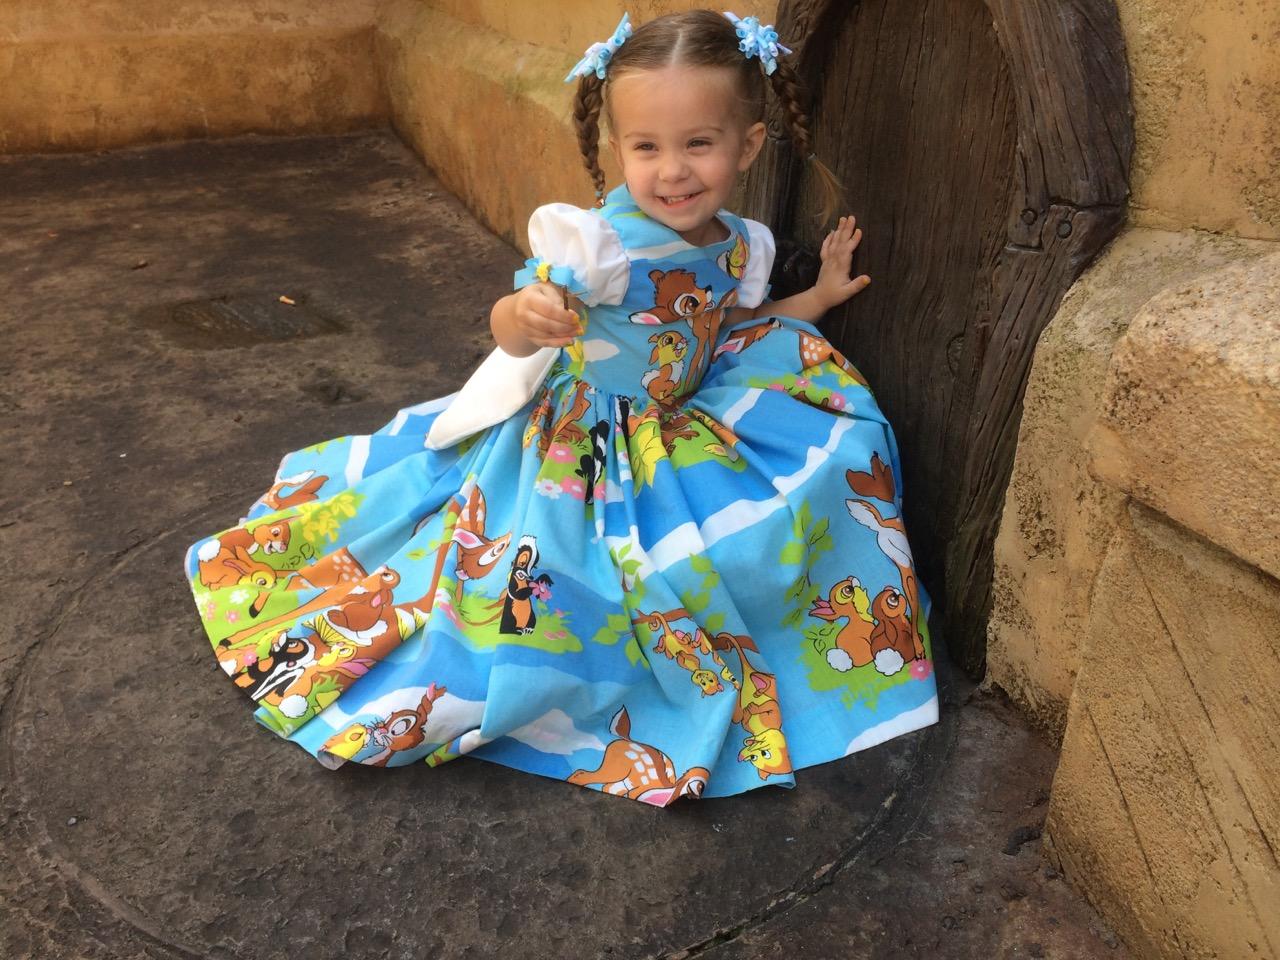 7f366264b177 Little princess  Mom s hand-made Disney costumes help shy girl blossom.  costume